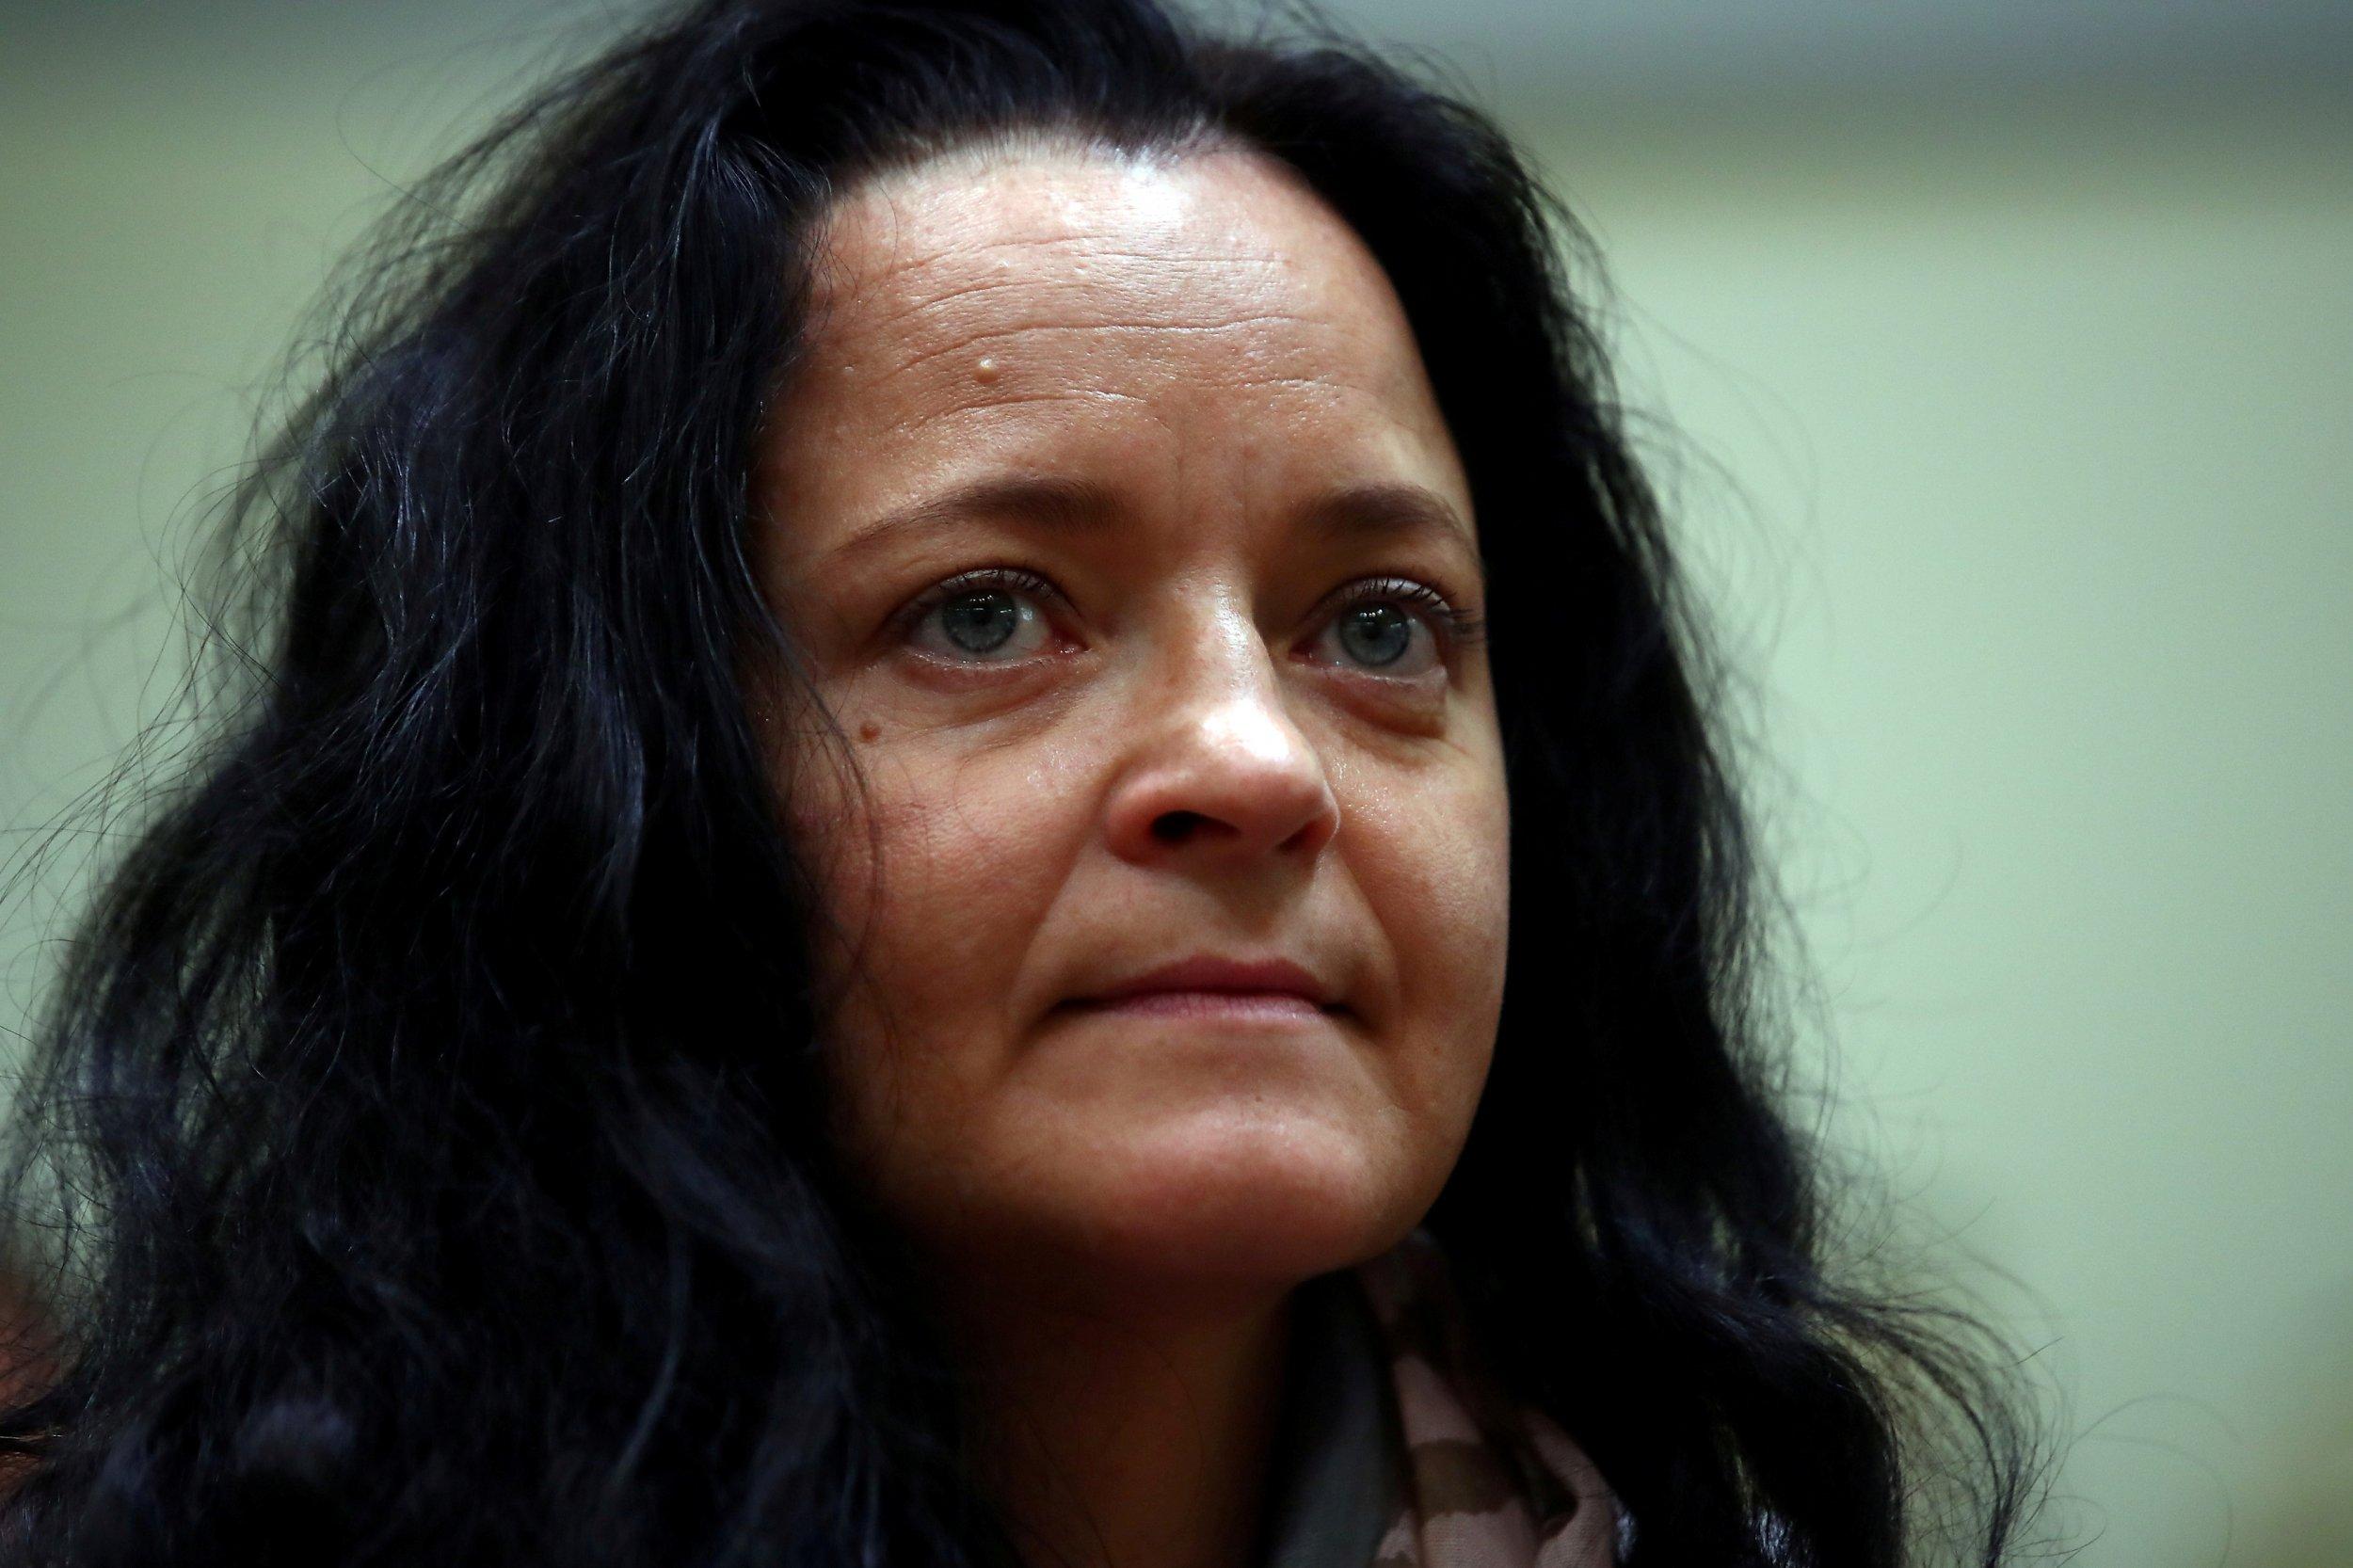 Neo-Nazi suspect, Germany